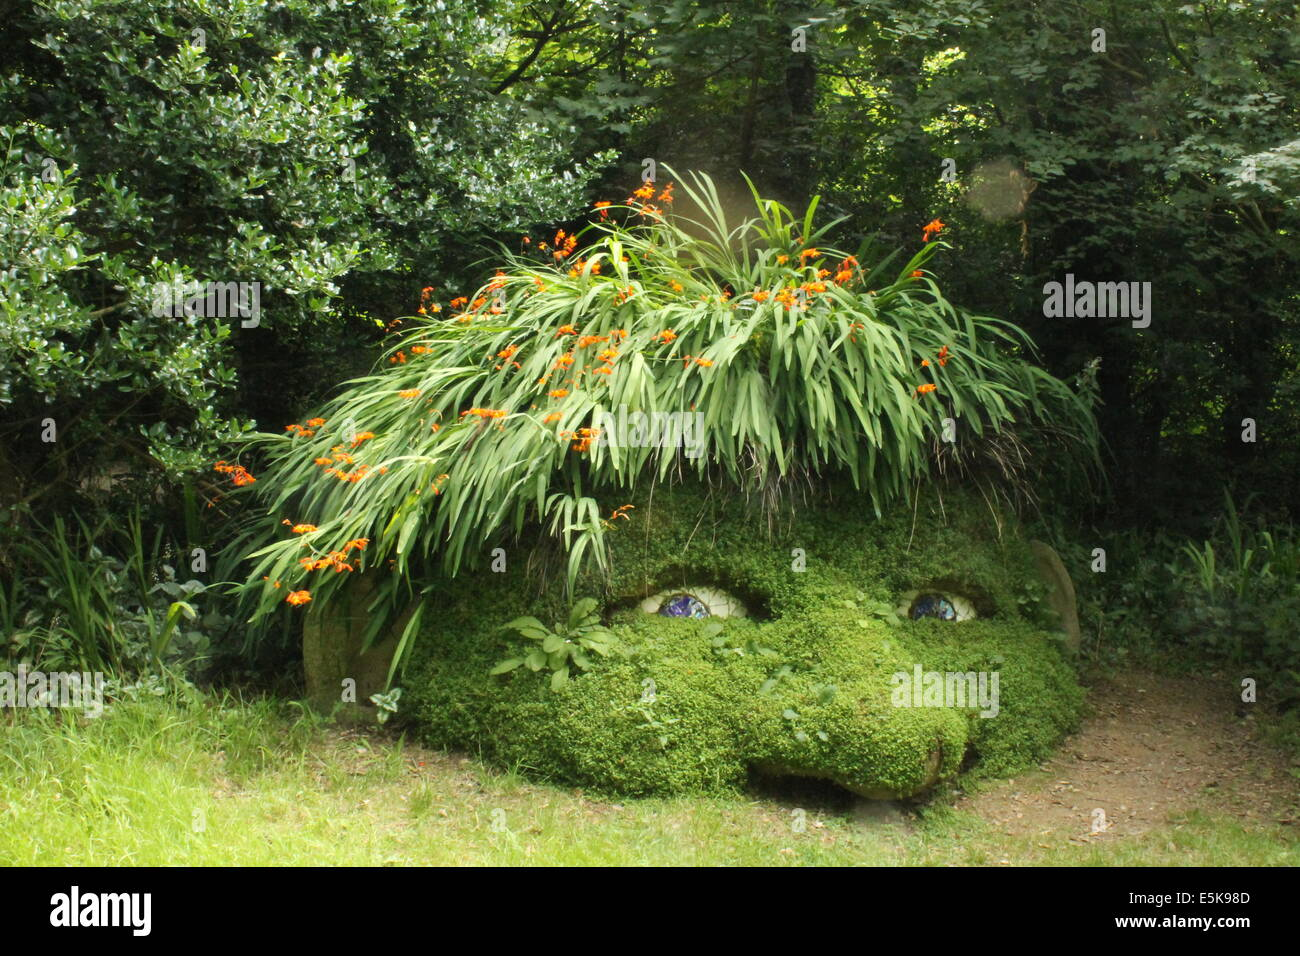 Des Riesen Kopf Wald Skulptur im Wald Garten bei The Lost Gardens of Heligan, Cornwall, England, UK Stockbild